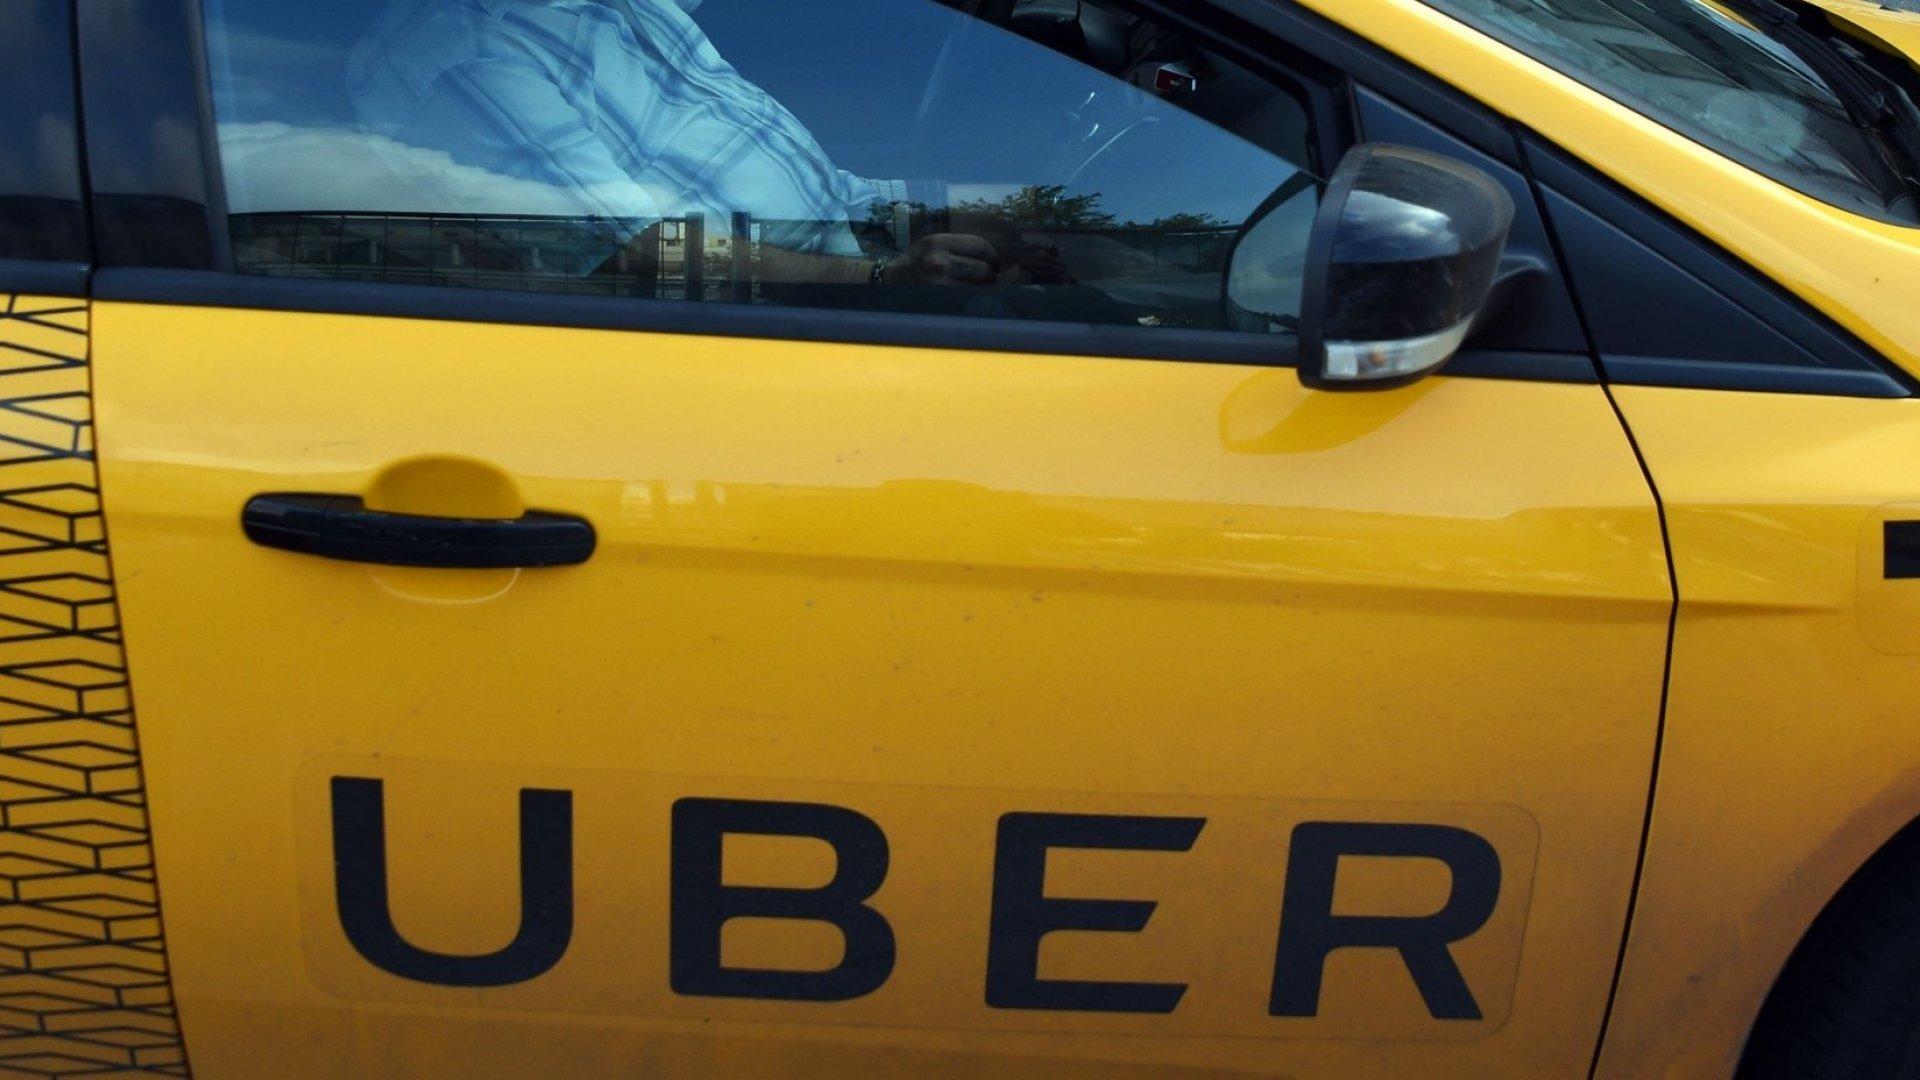 Uber Self-Driving Car Hits and Kills Pedestrian (Uber Immediately Halts Testing Nationwide)